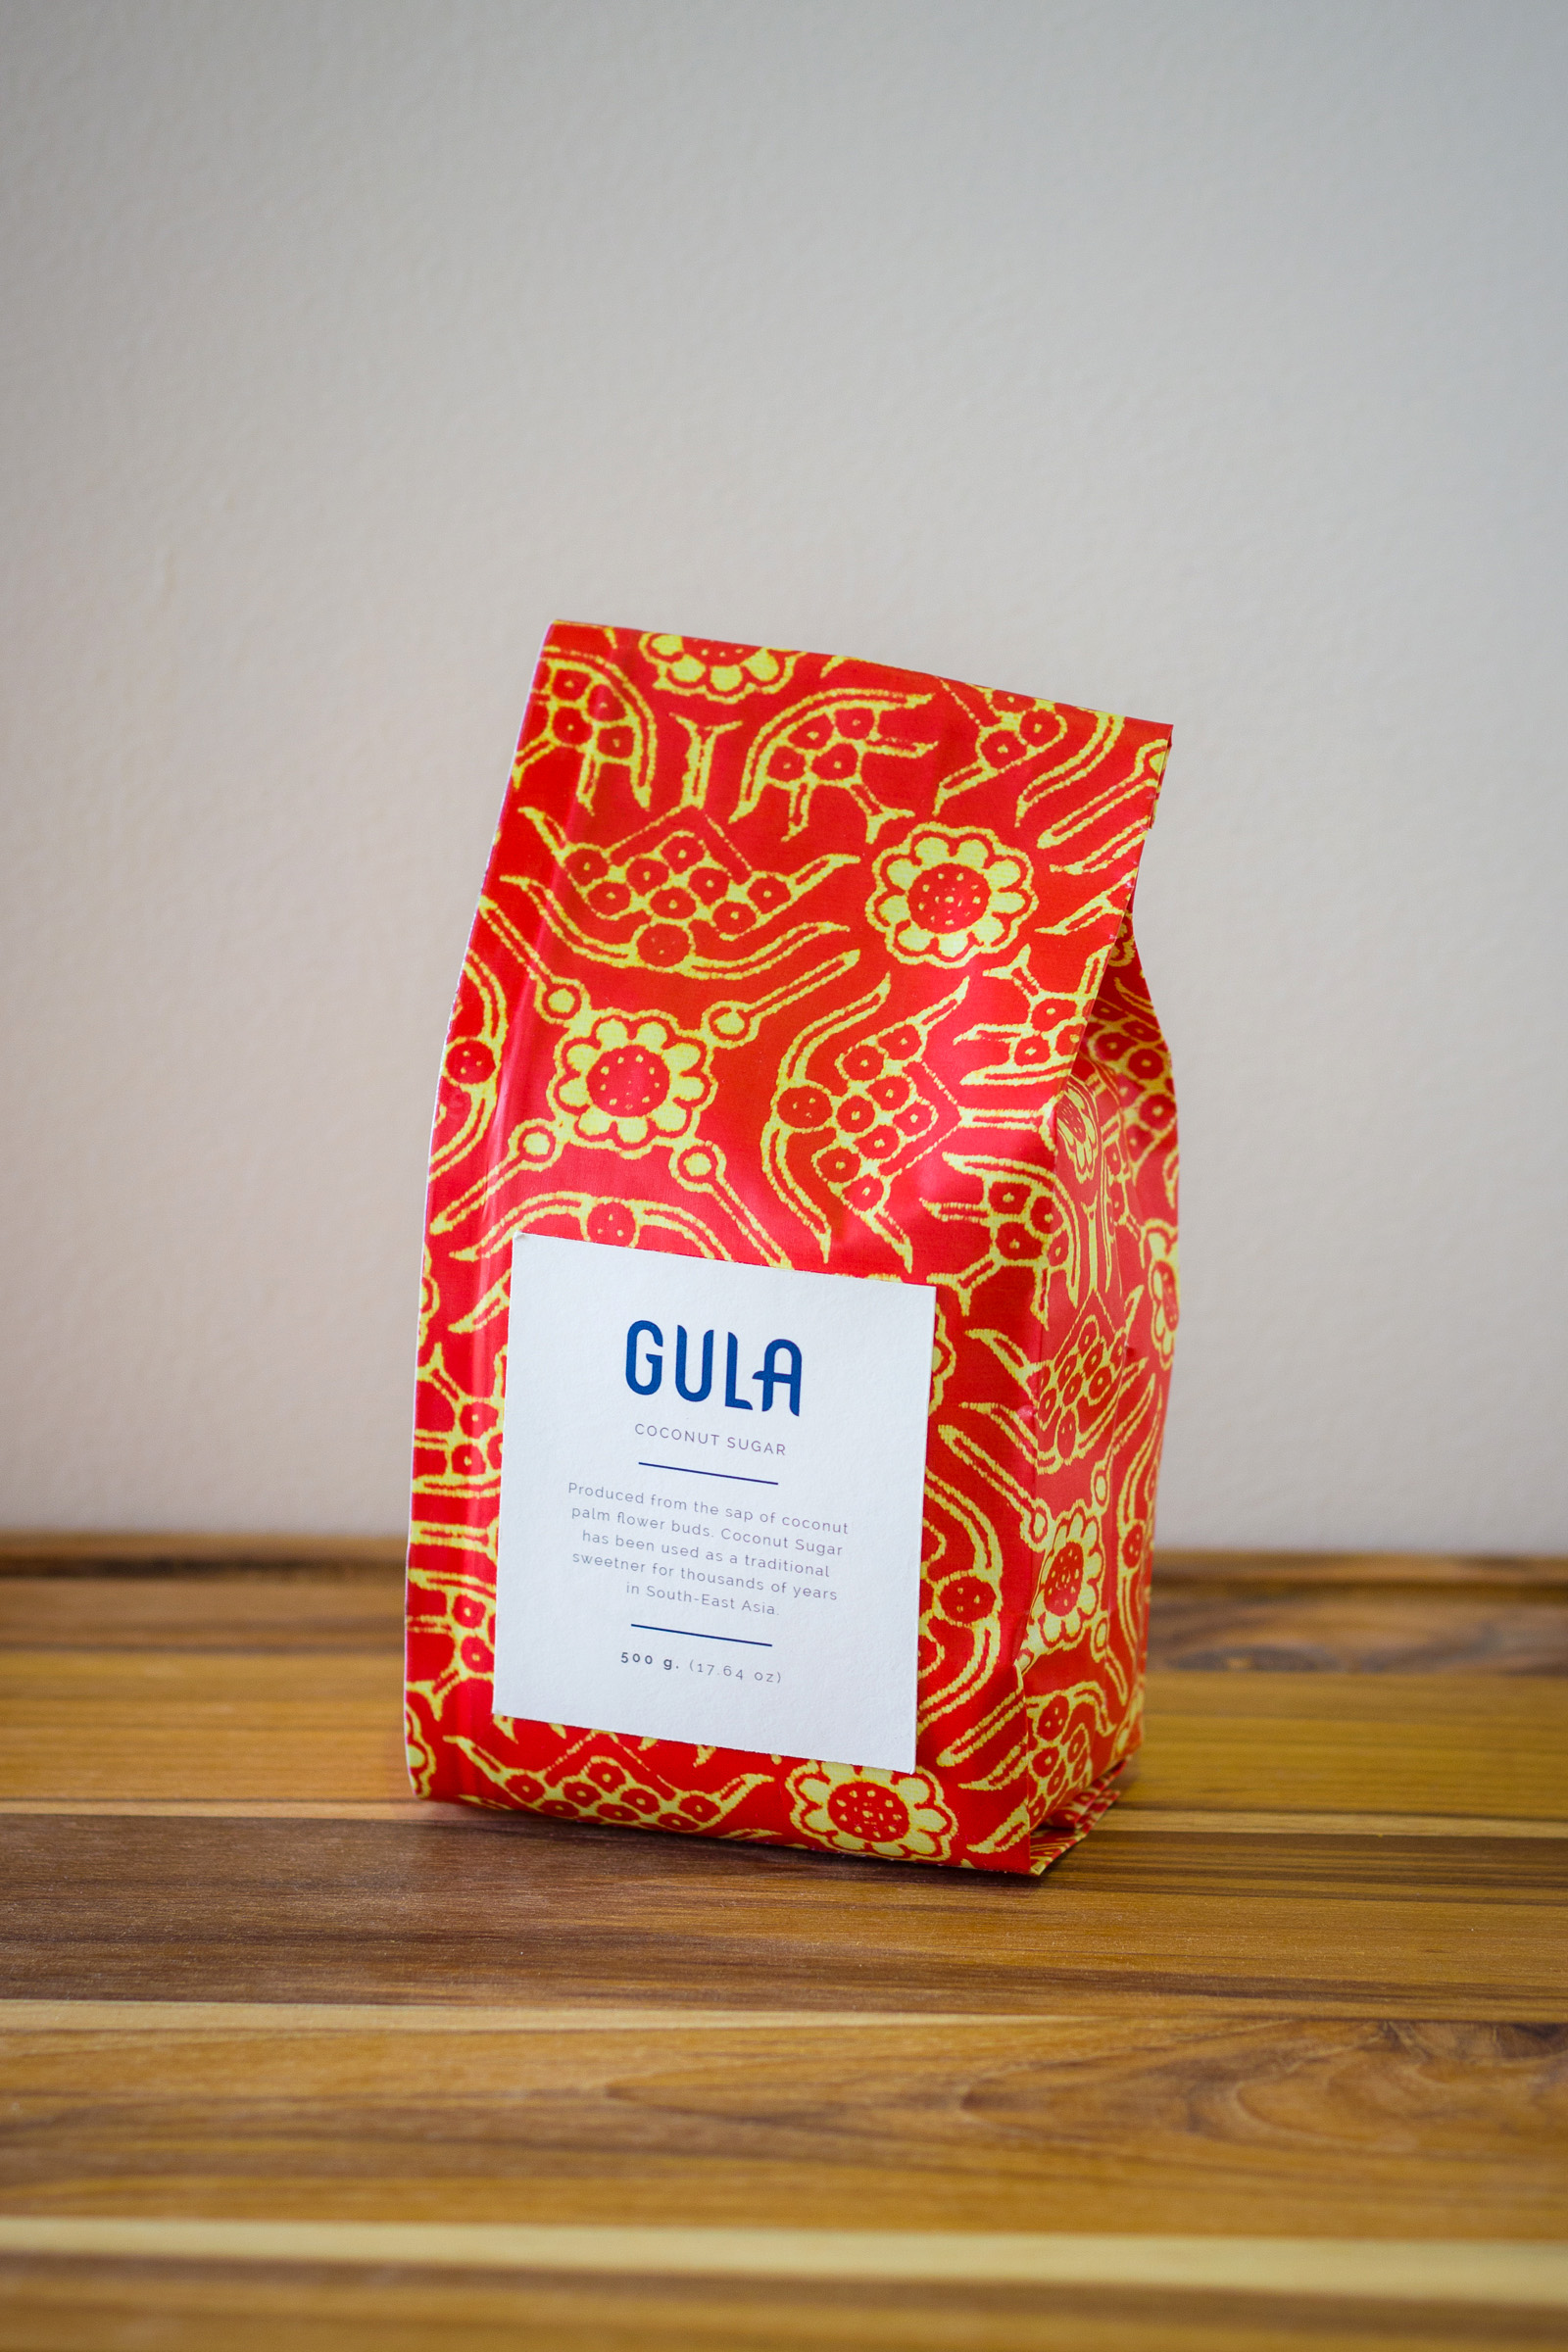 gula_packaging_noblue_vin-1.jpg